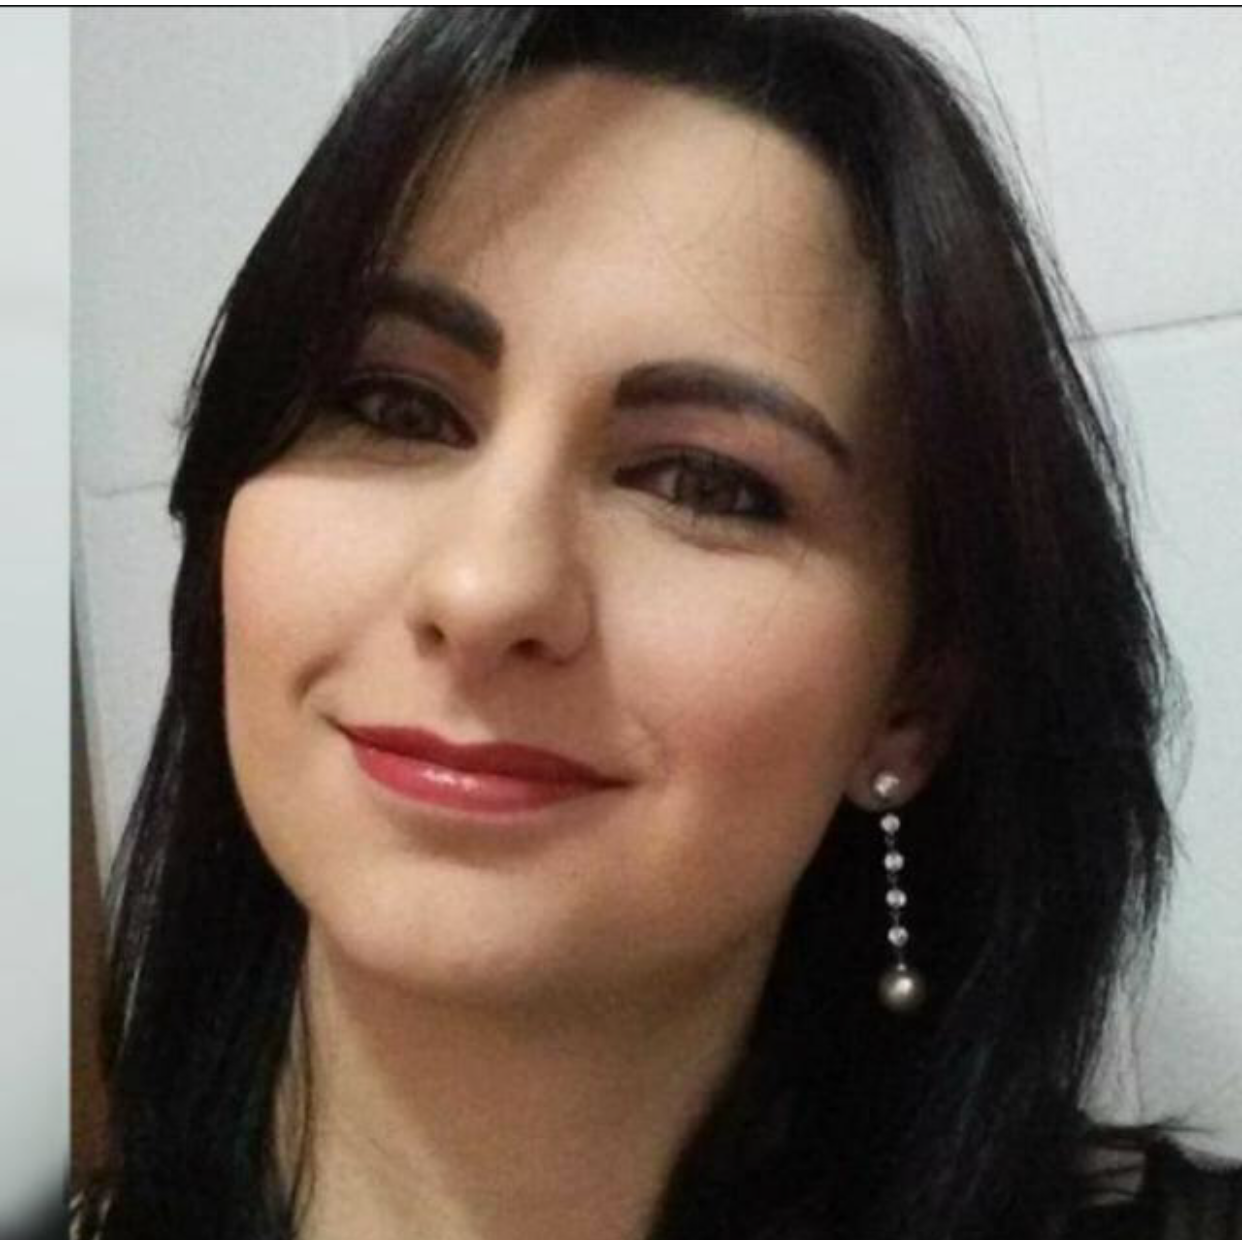 Rhanielle de Castro Lima Foltran